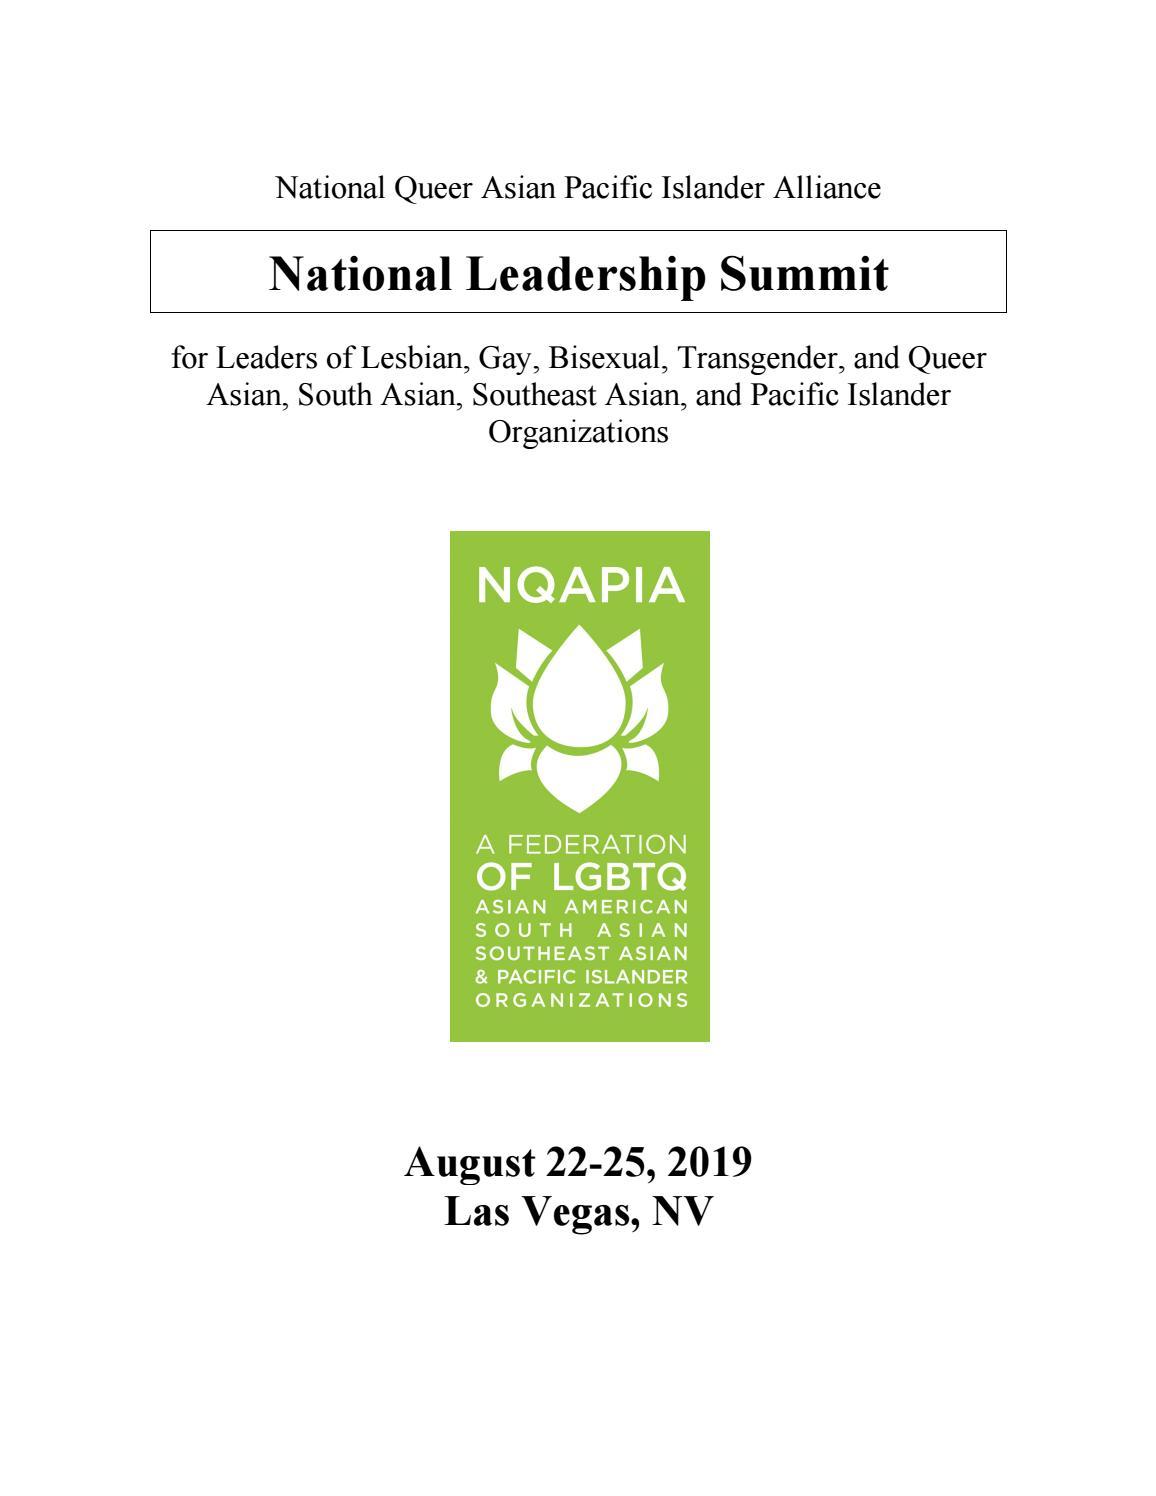 NQAPIA National Summit Training Manual 2019 by Glenn